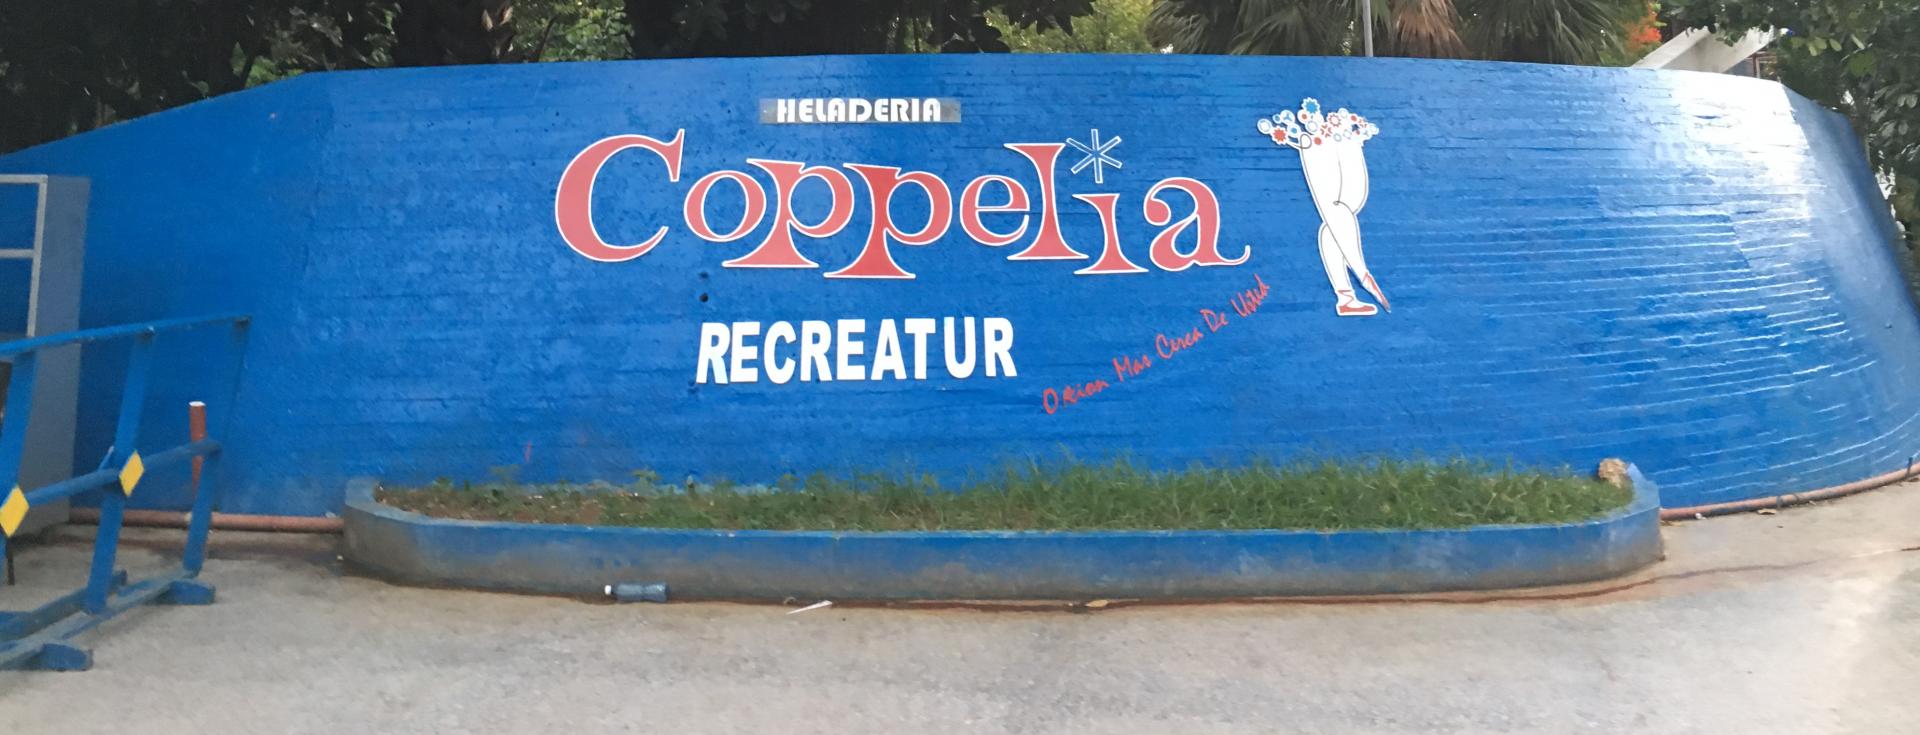 Coppelia is everyone's favorite in Cuba.